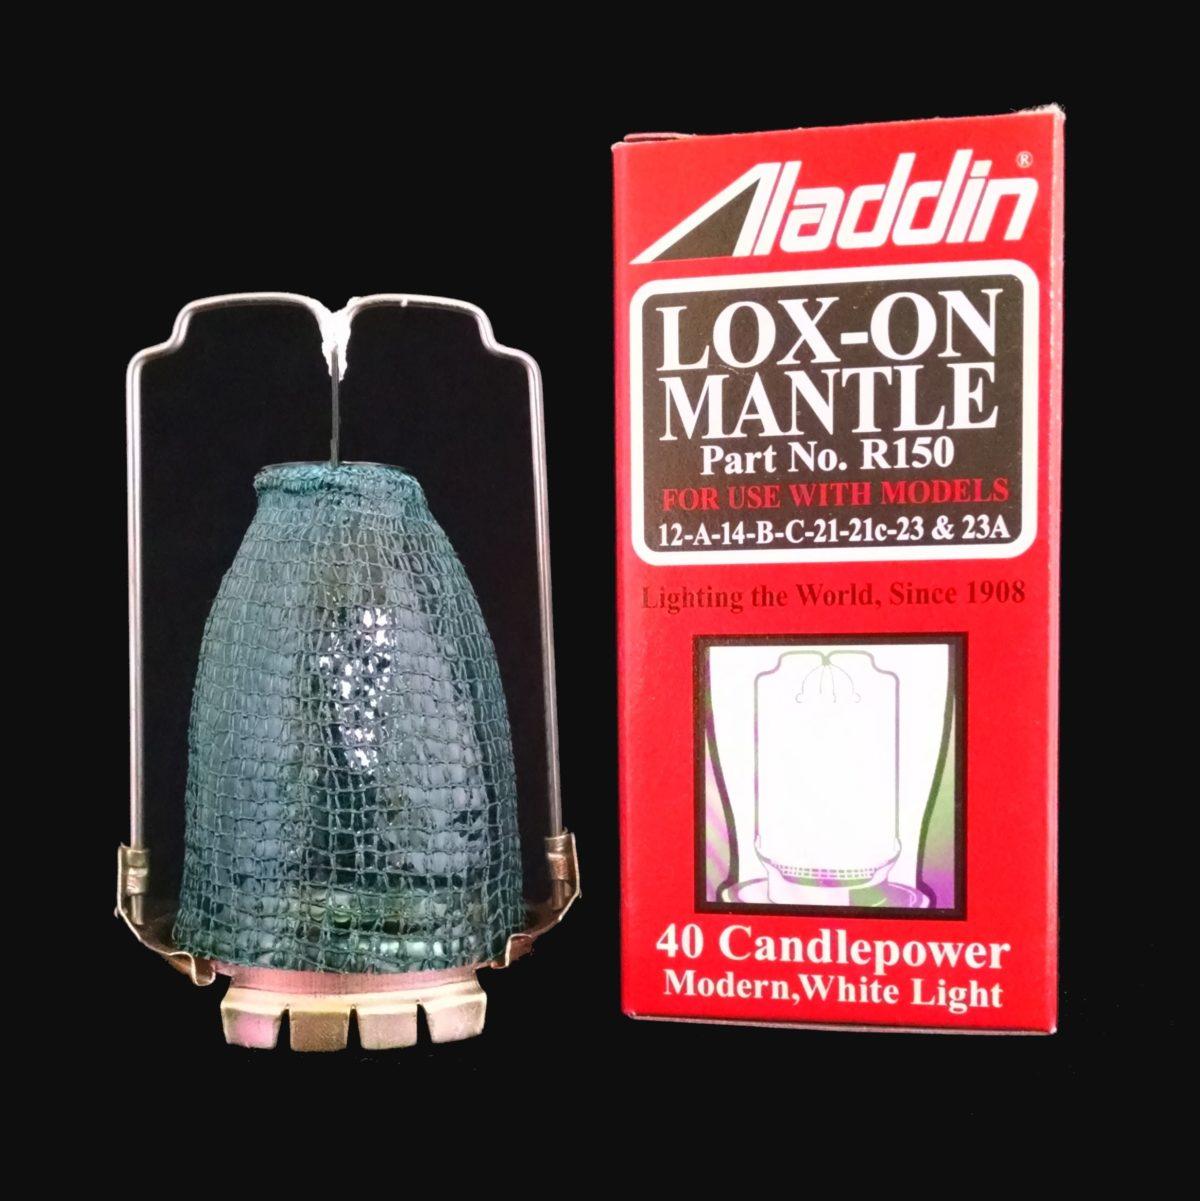 Aladdin Lamp Honey Amber Grand Vertique with Fall Oak Shade & Nickel  Hardware